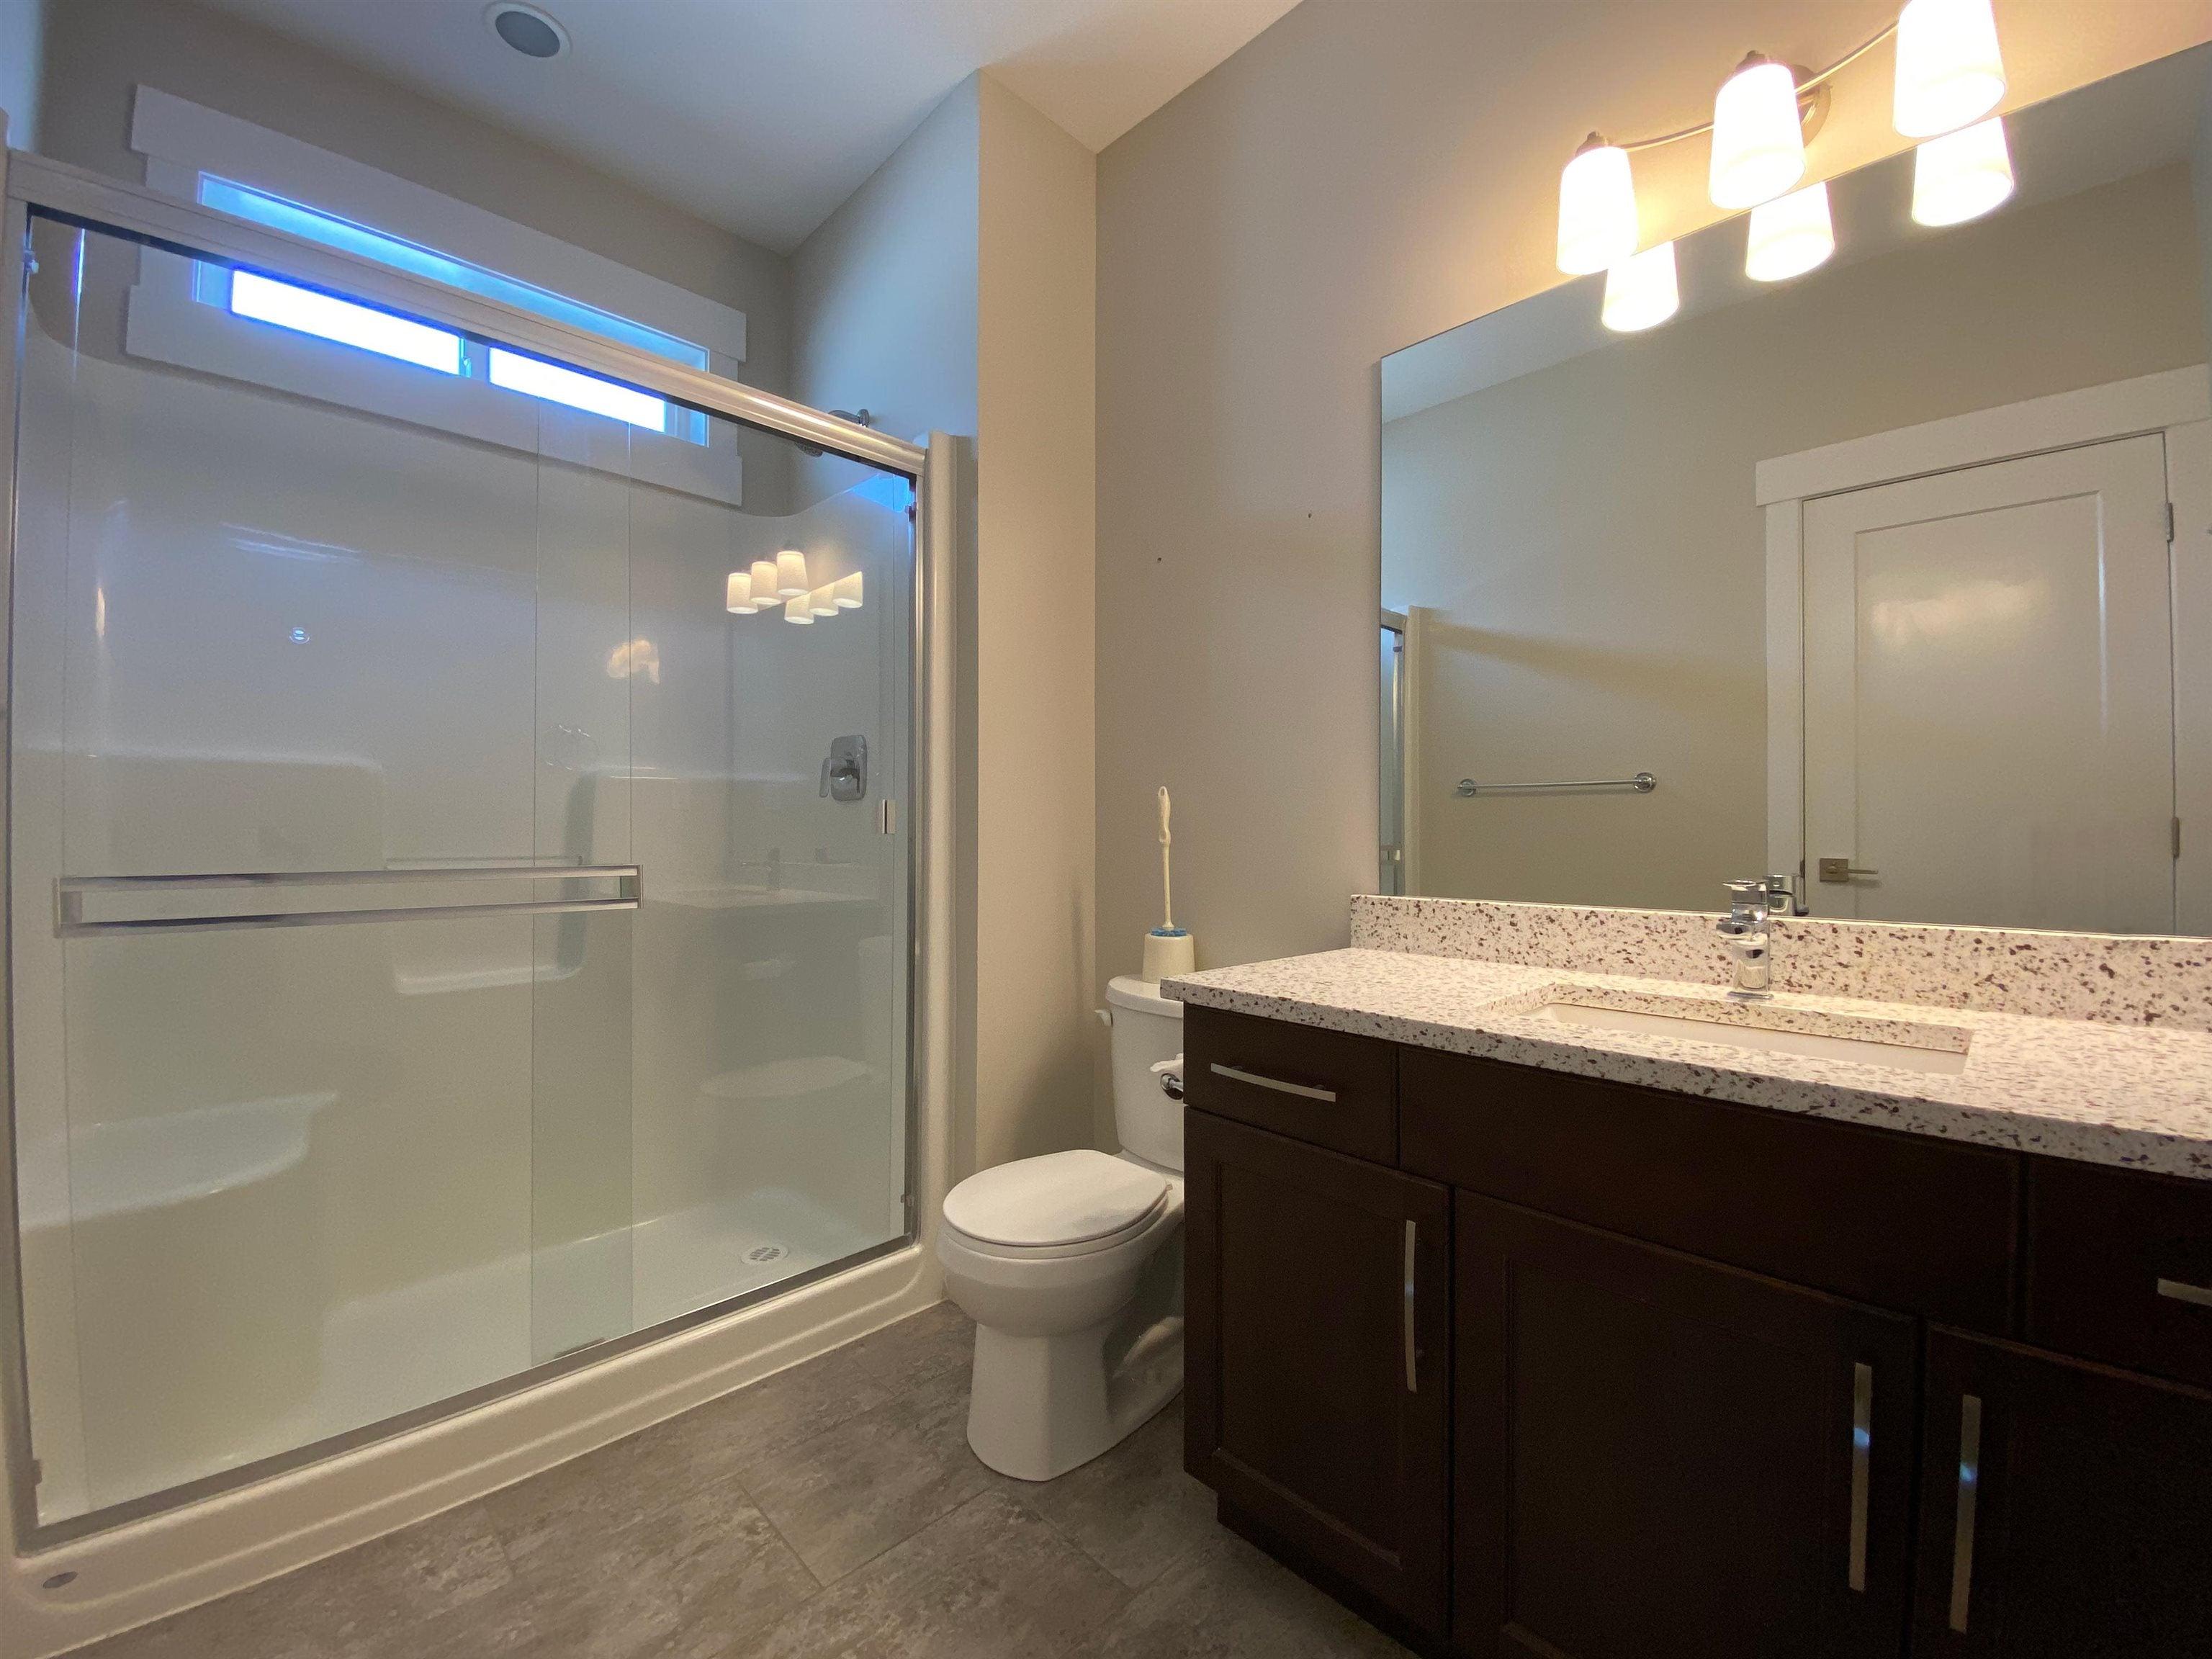 10144 KILLARNEY DRIVE - Fairfield Island House/Single Family for sale, 5 Bedrooms (R2625716) - #27